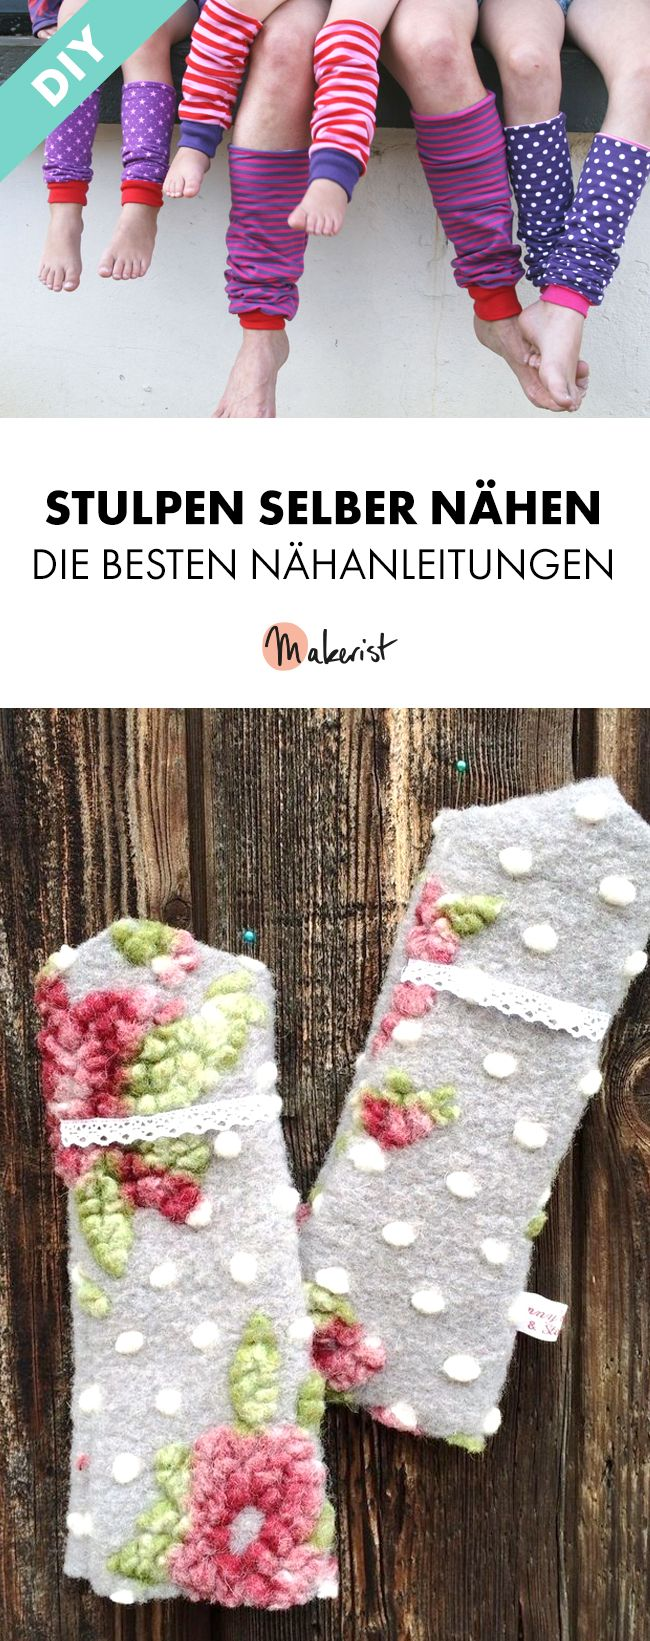 888 best Nähen: Tiere, Deko, Geschenke images on Pinterest | Animaux ...